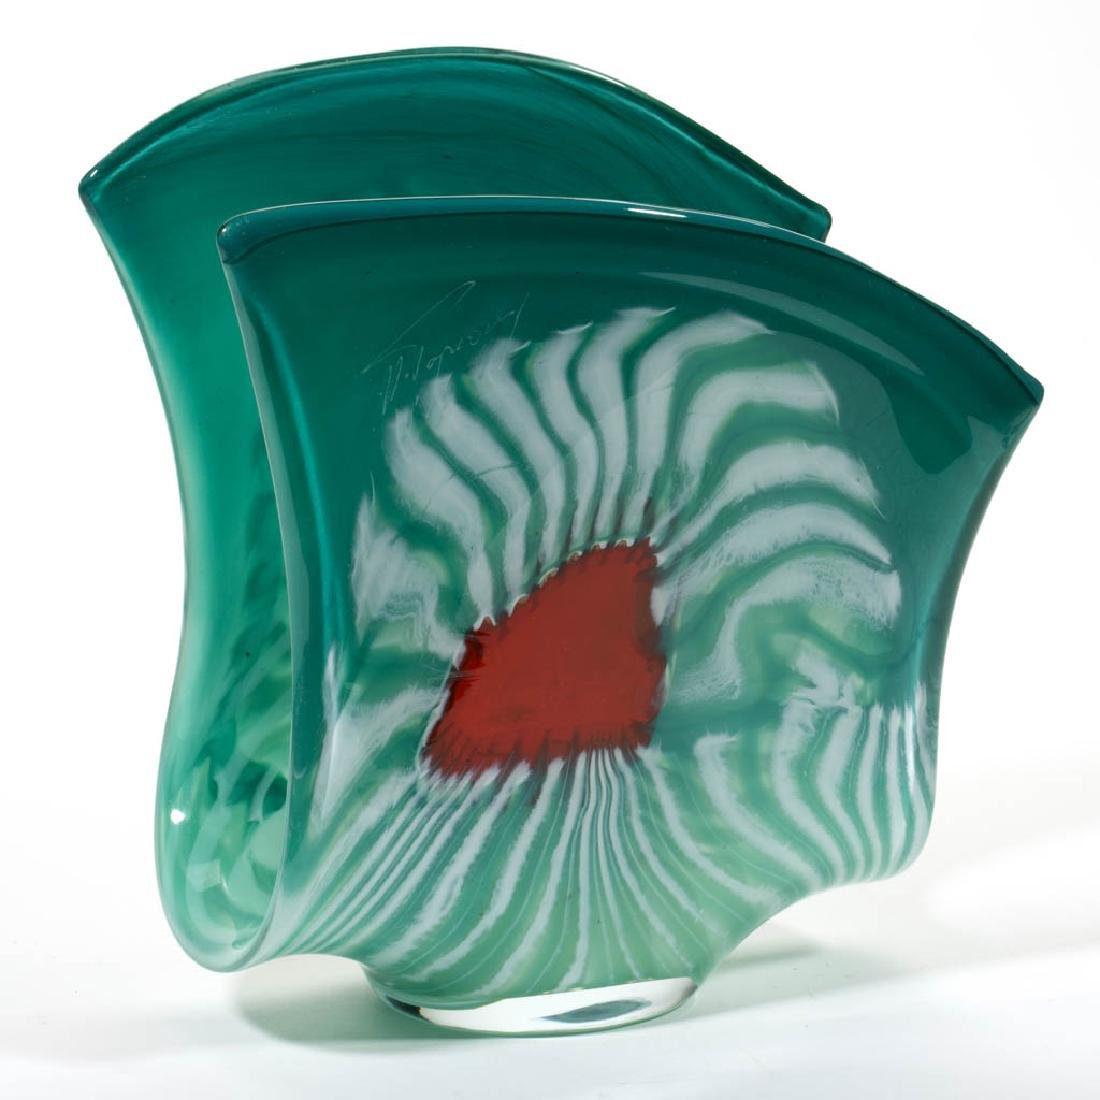 UNIDENTIFIED STUDIO ART GLASS SCULPTURE